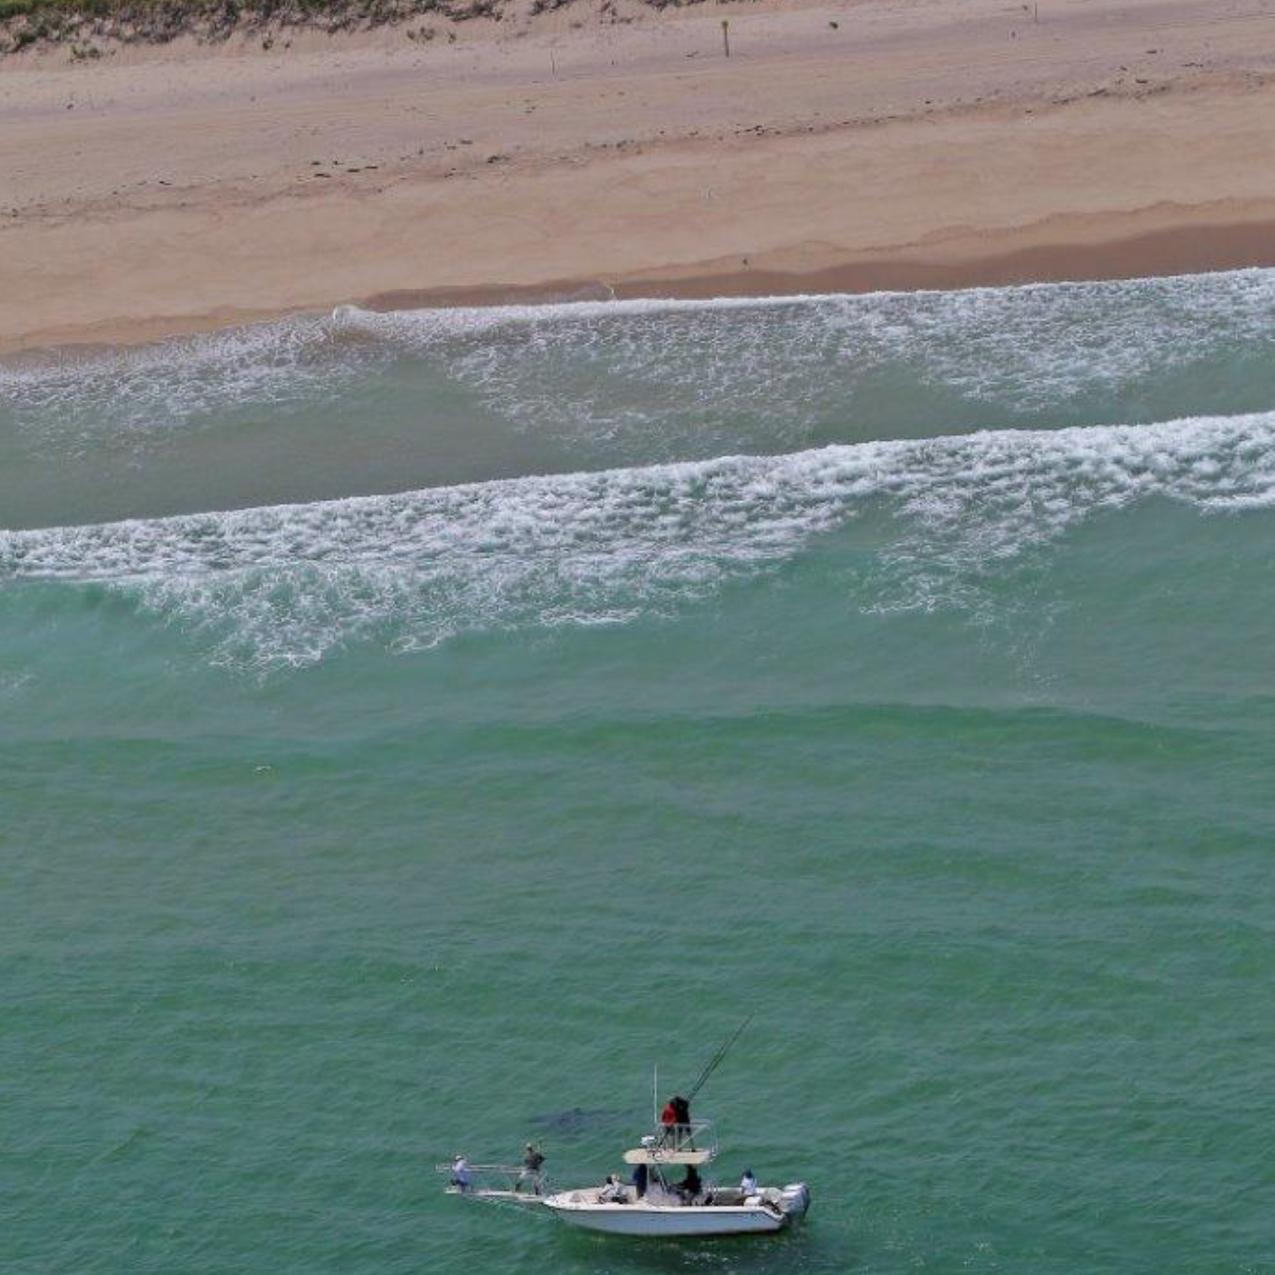 Photo courtesy Wayne Davis working a white shark off Nauset Beach, Orleans, Massachusetts